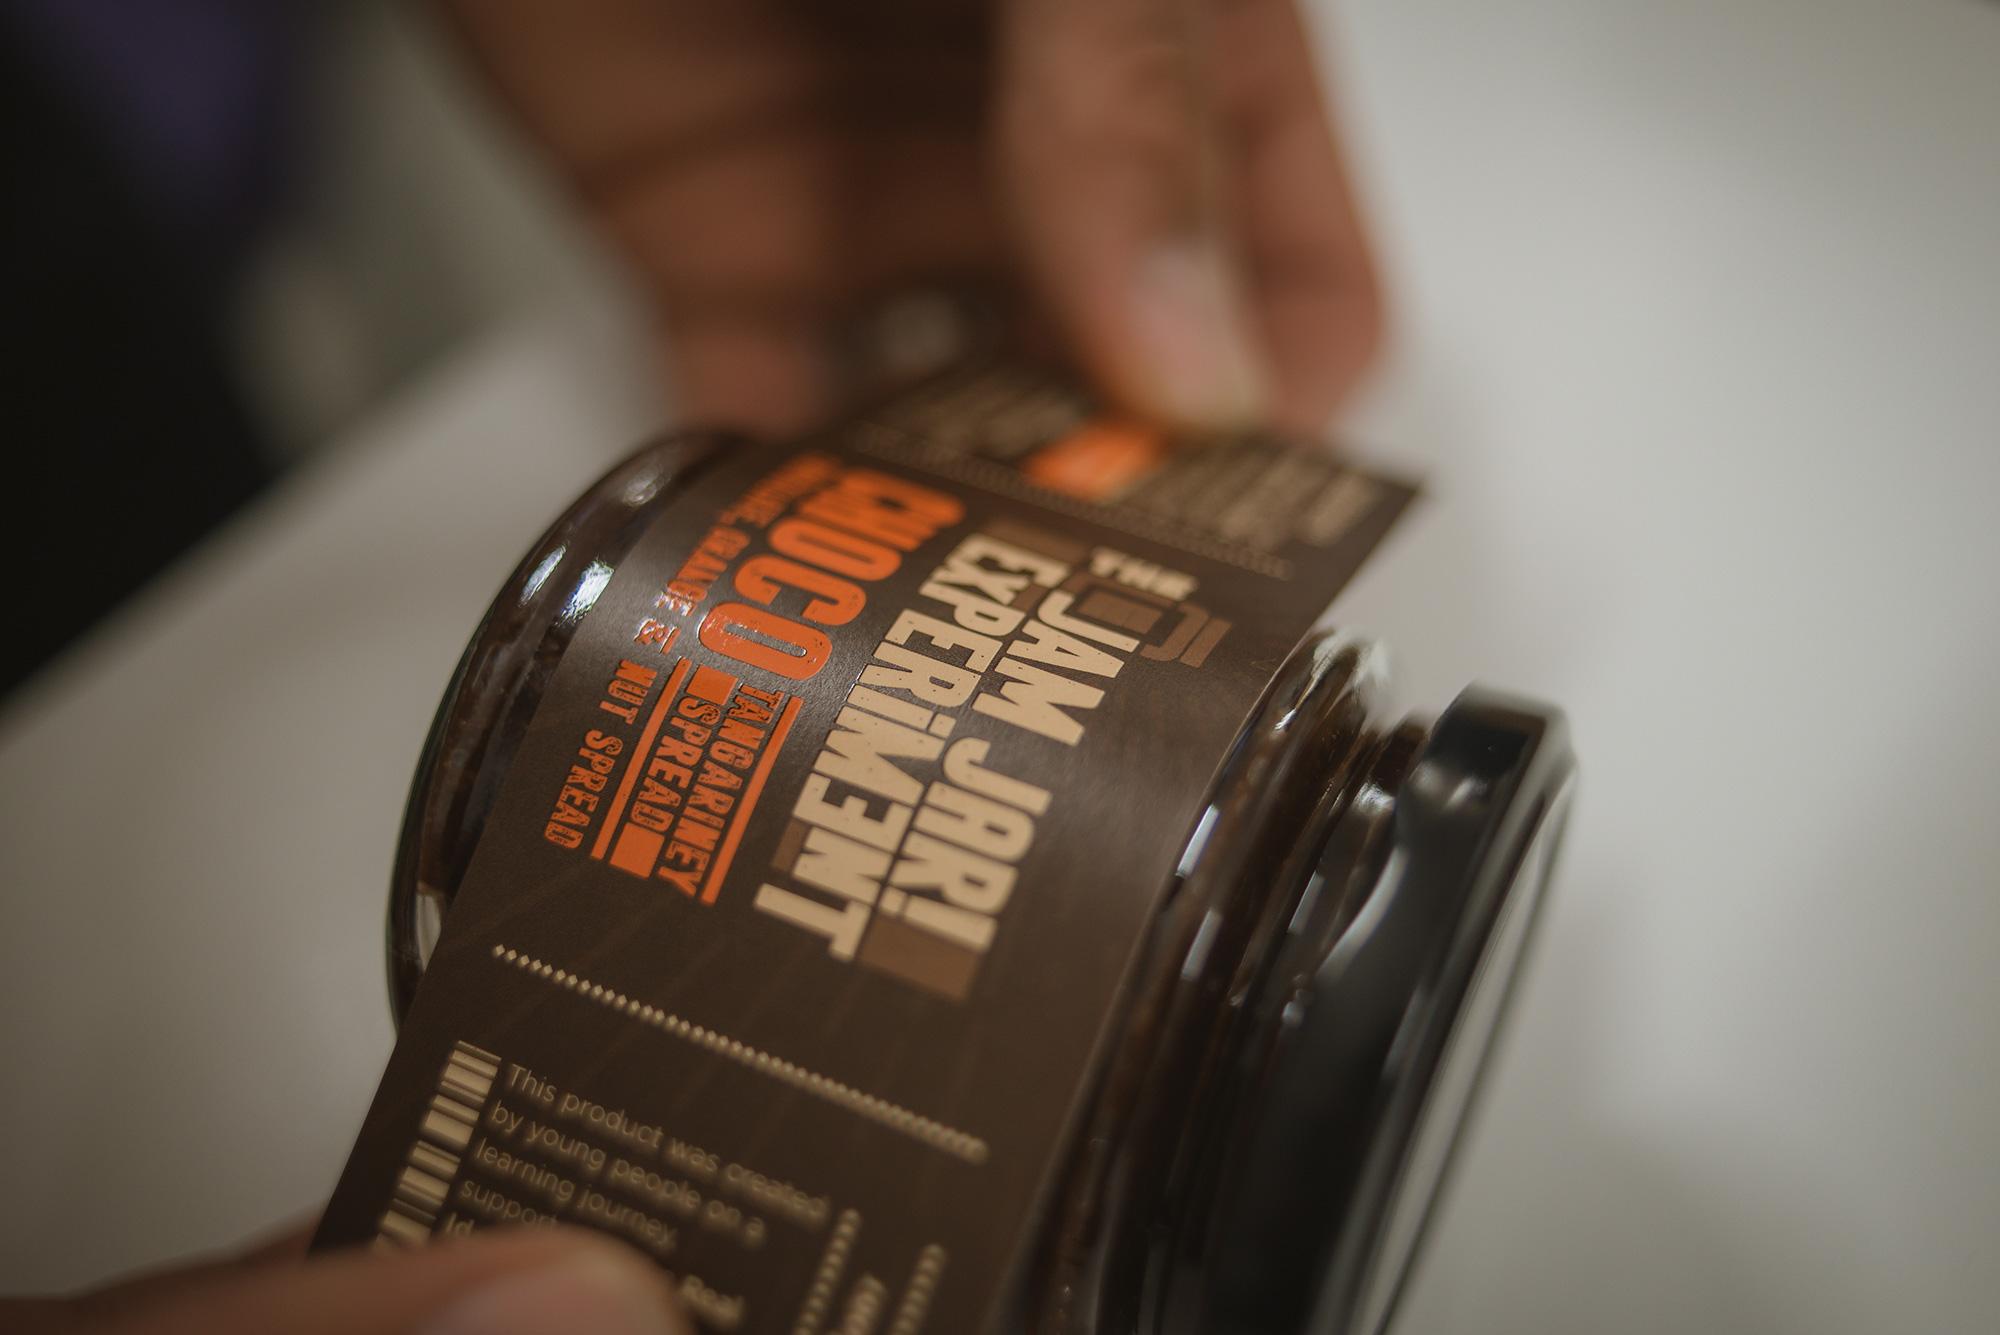 the-jam-jar-experiment-label.jpg